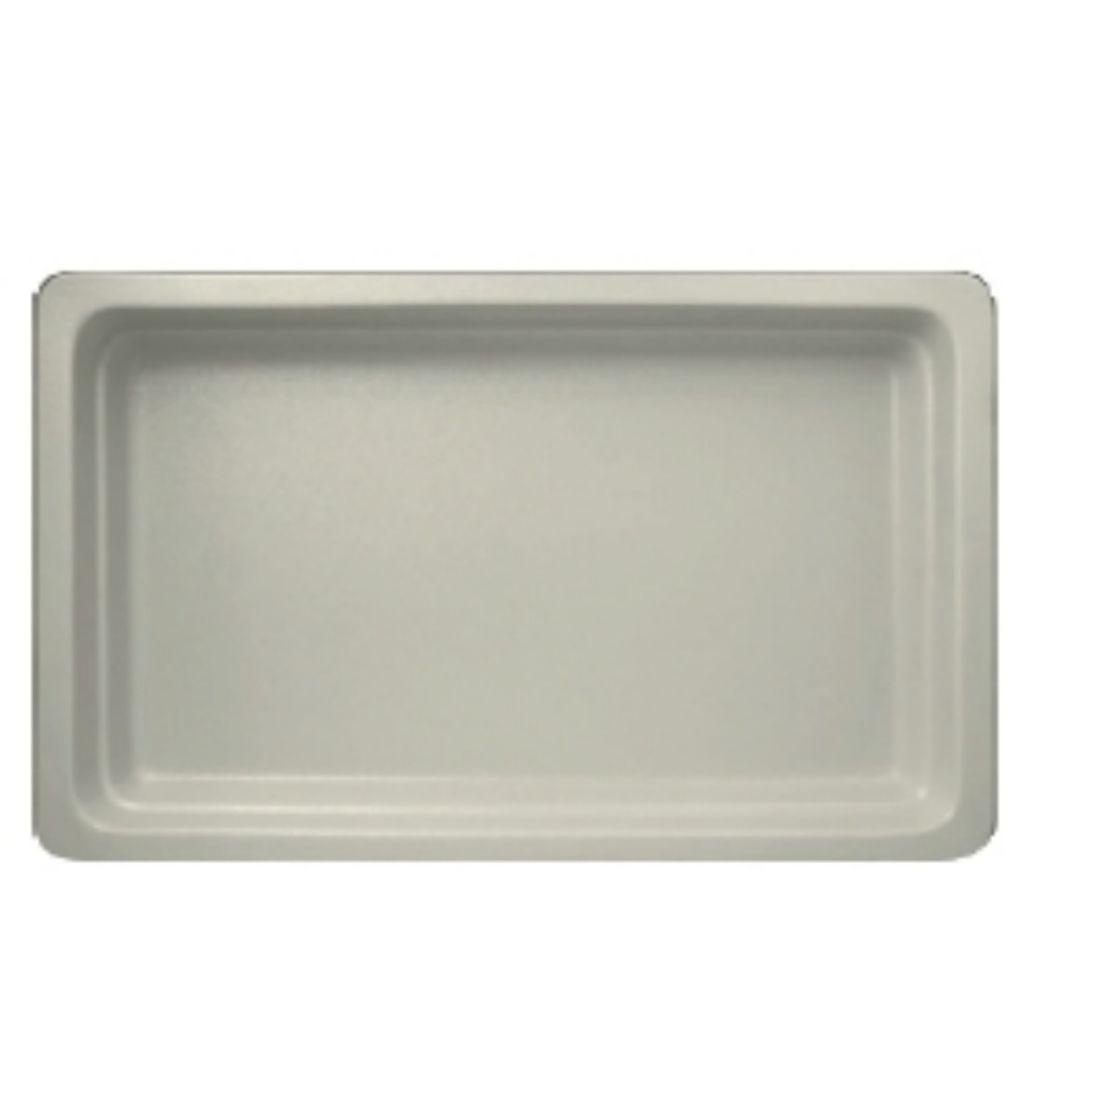 Gastronádoba porcelánová Neofusion GN 1/1 65 mm bílá mat